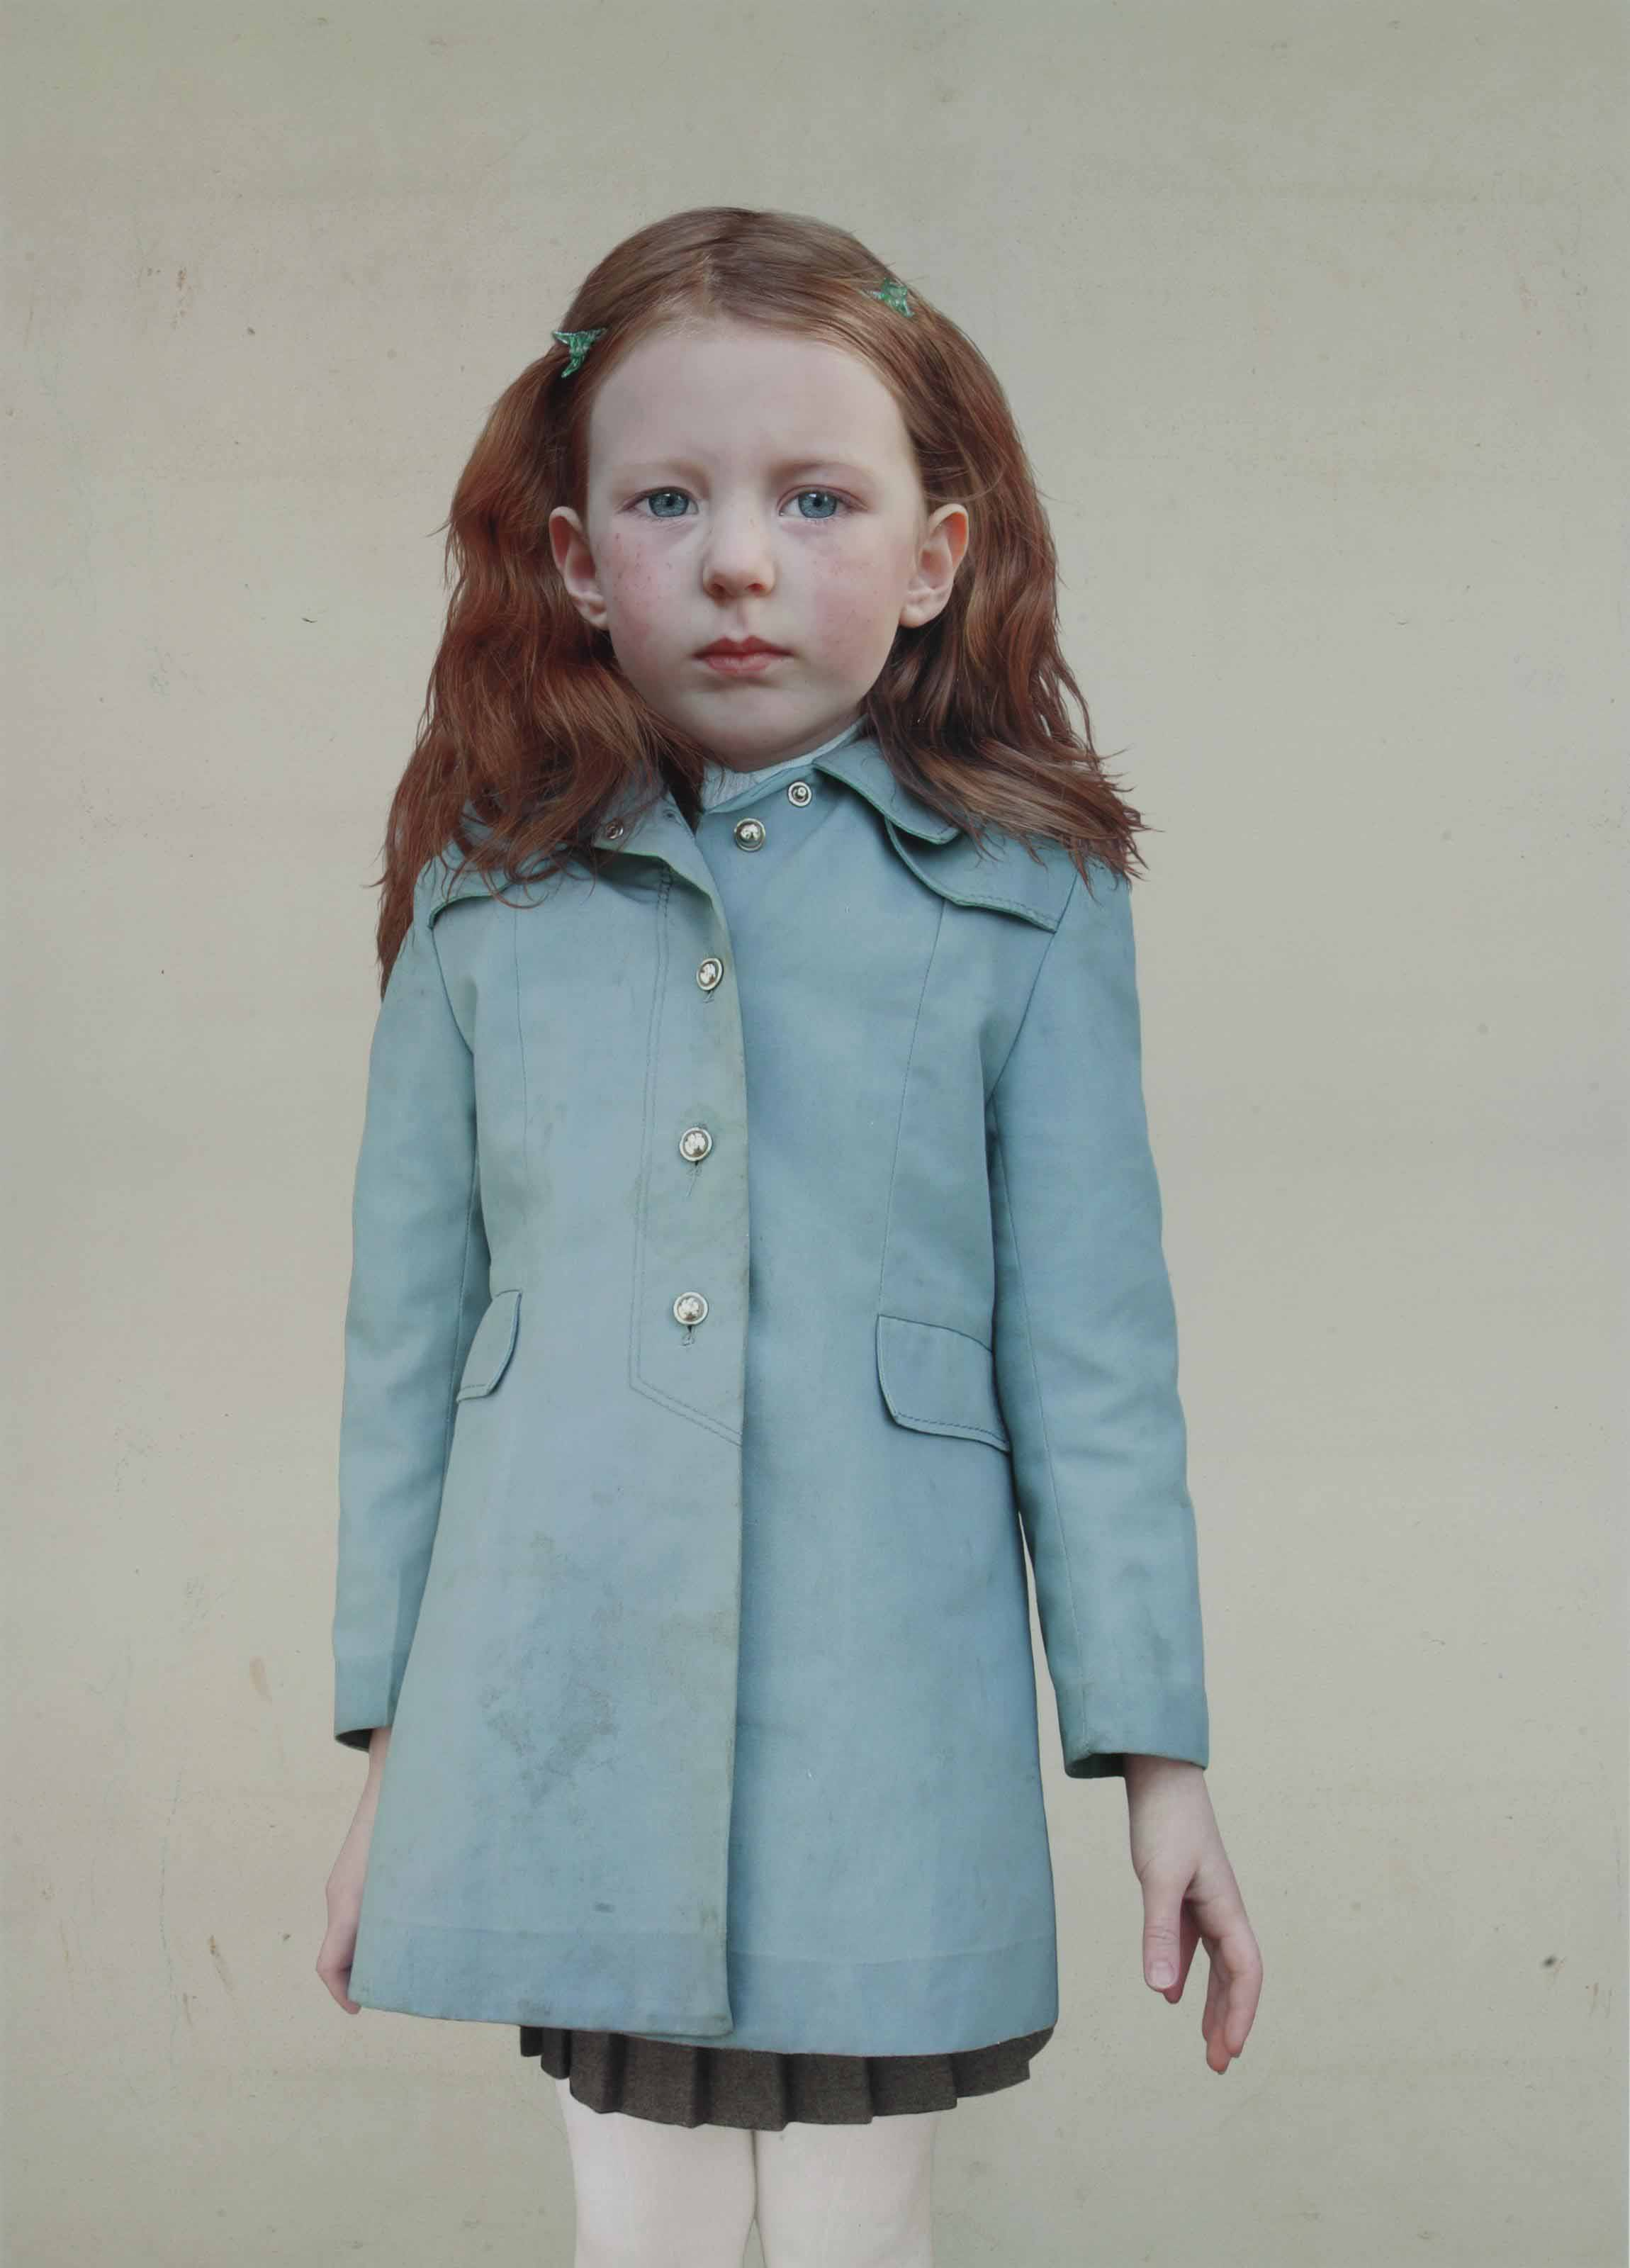 Marianne, 2004